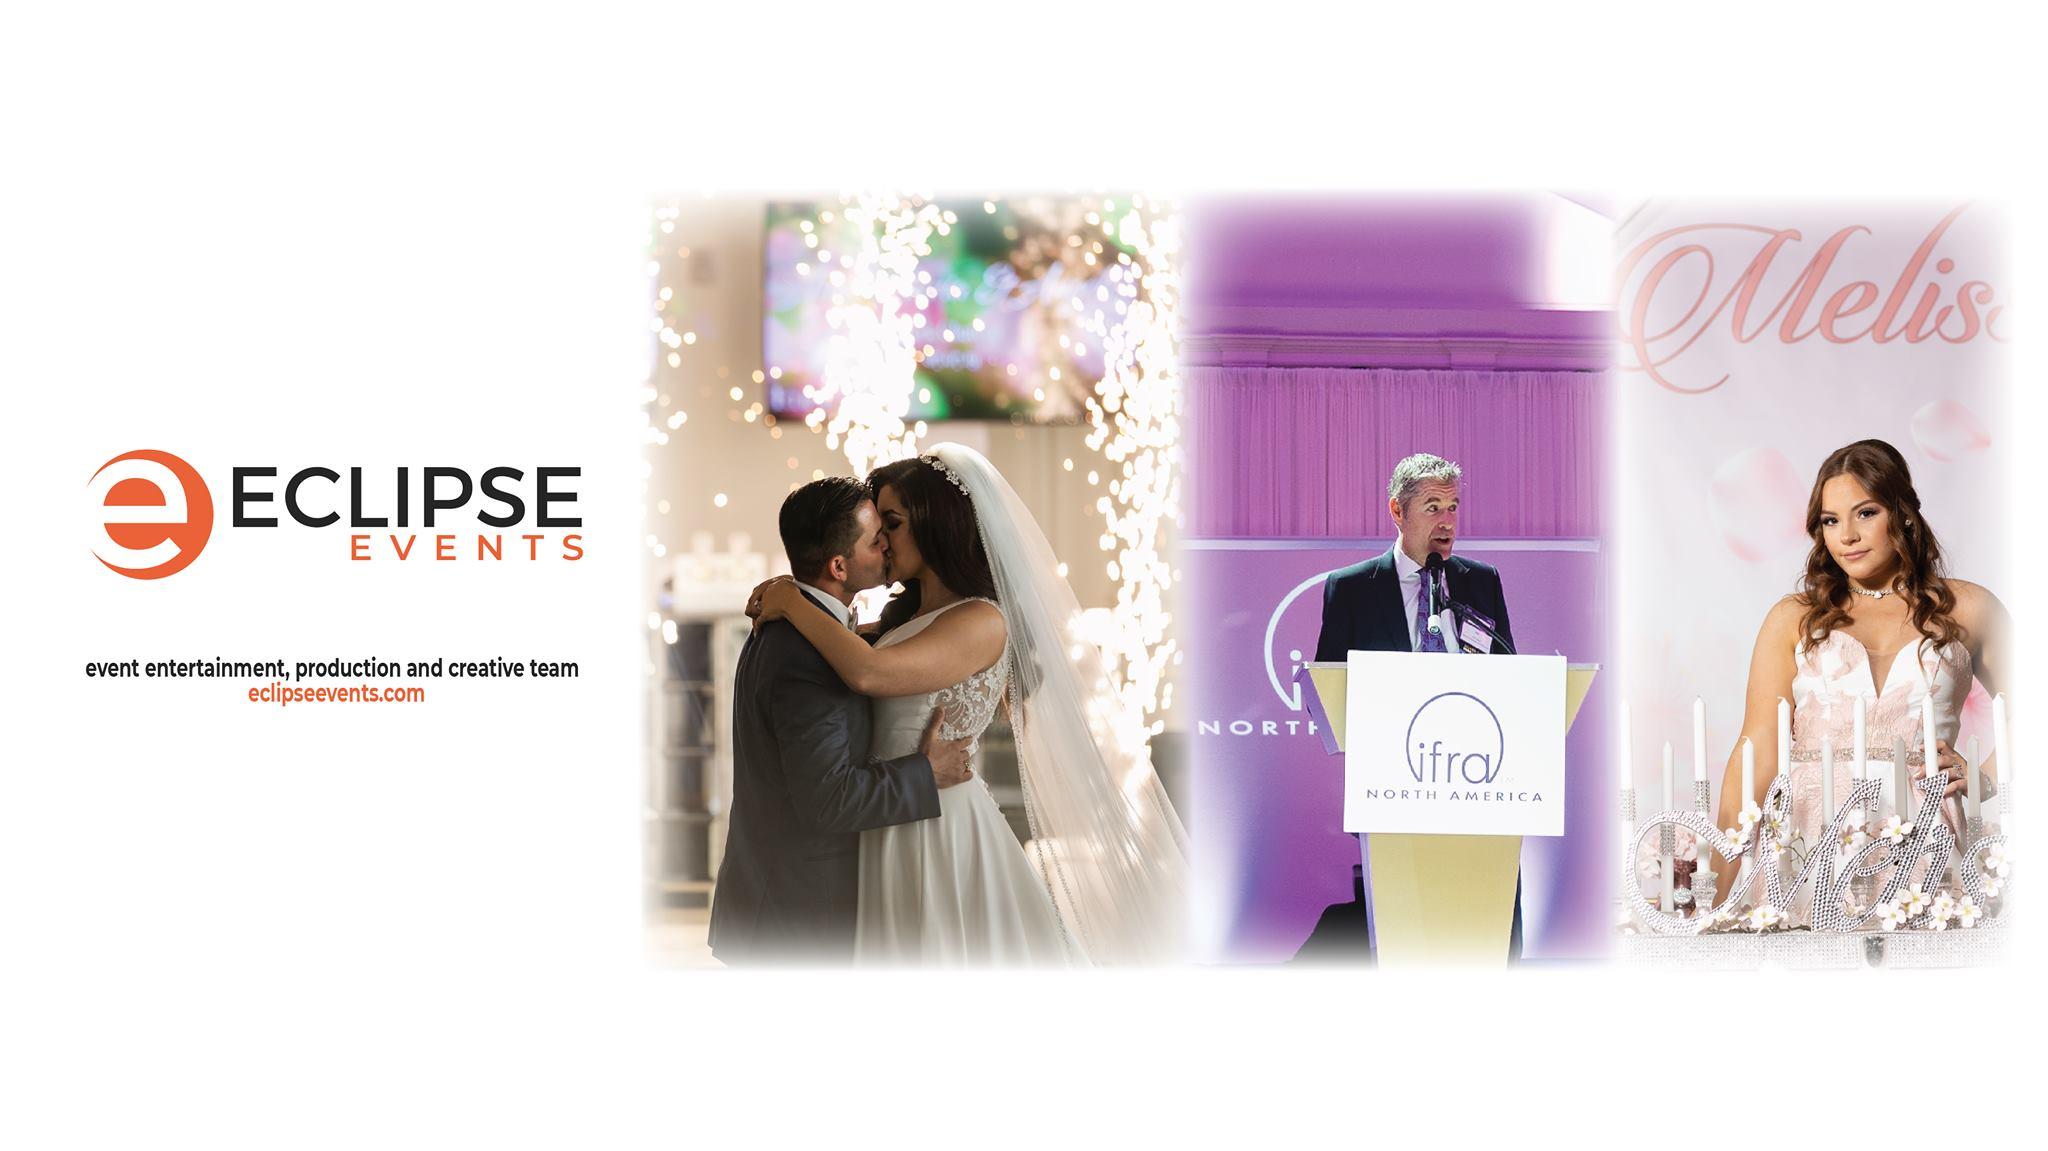 704-Eclipse Events wedding DJ